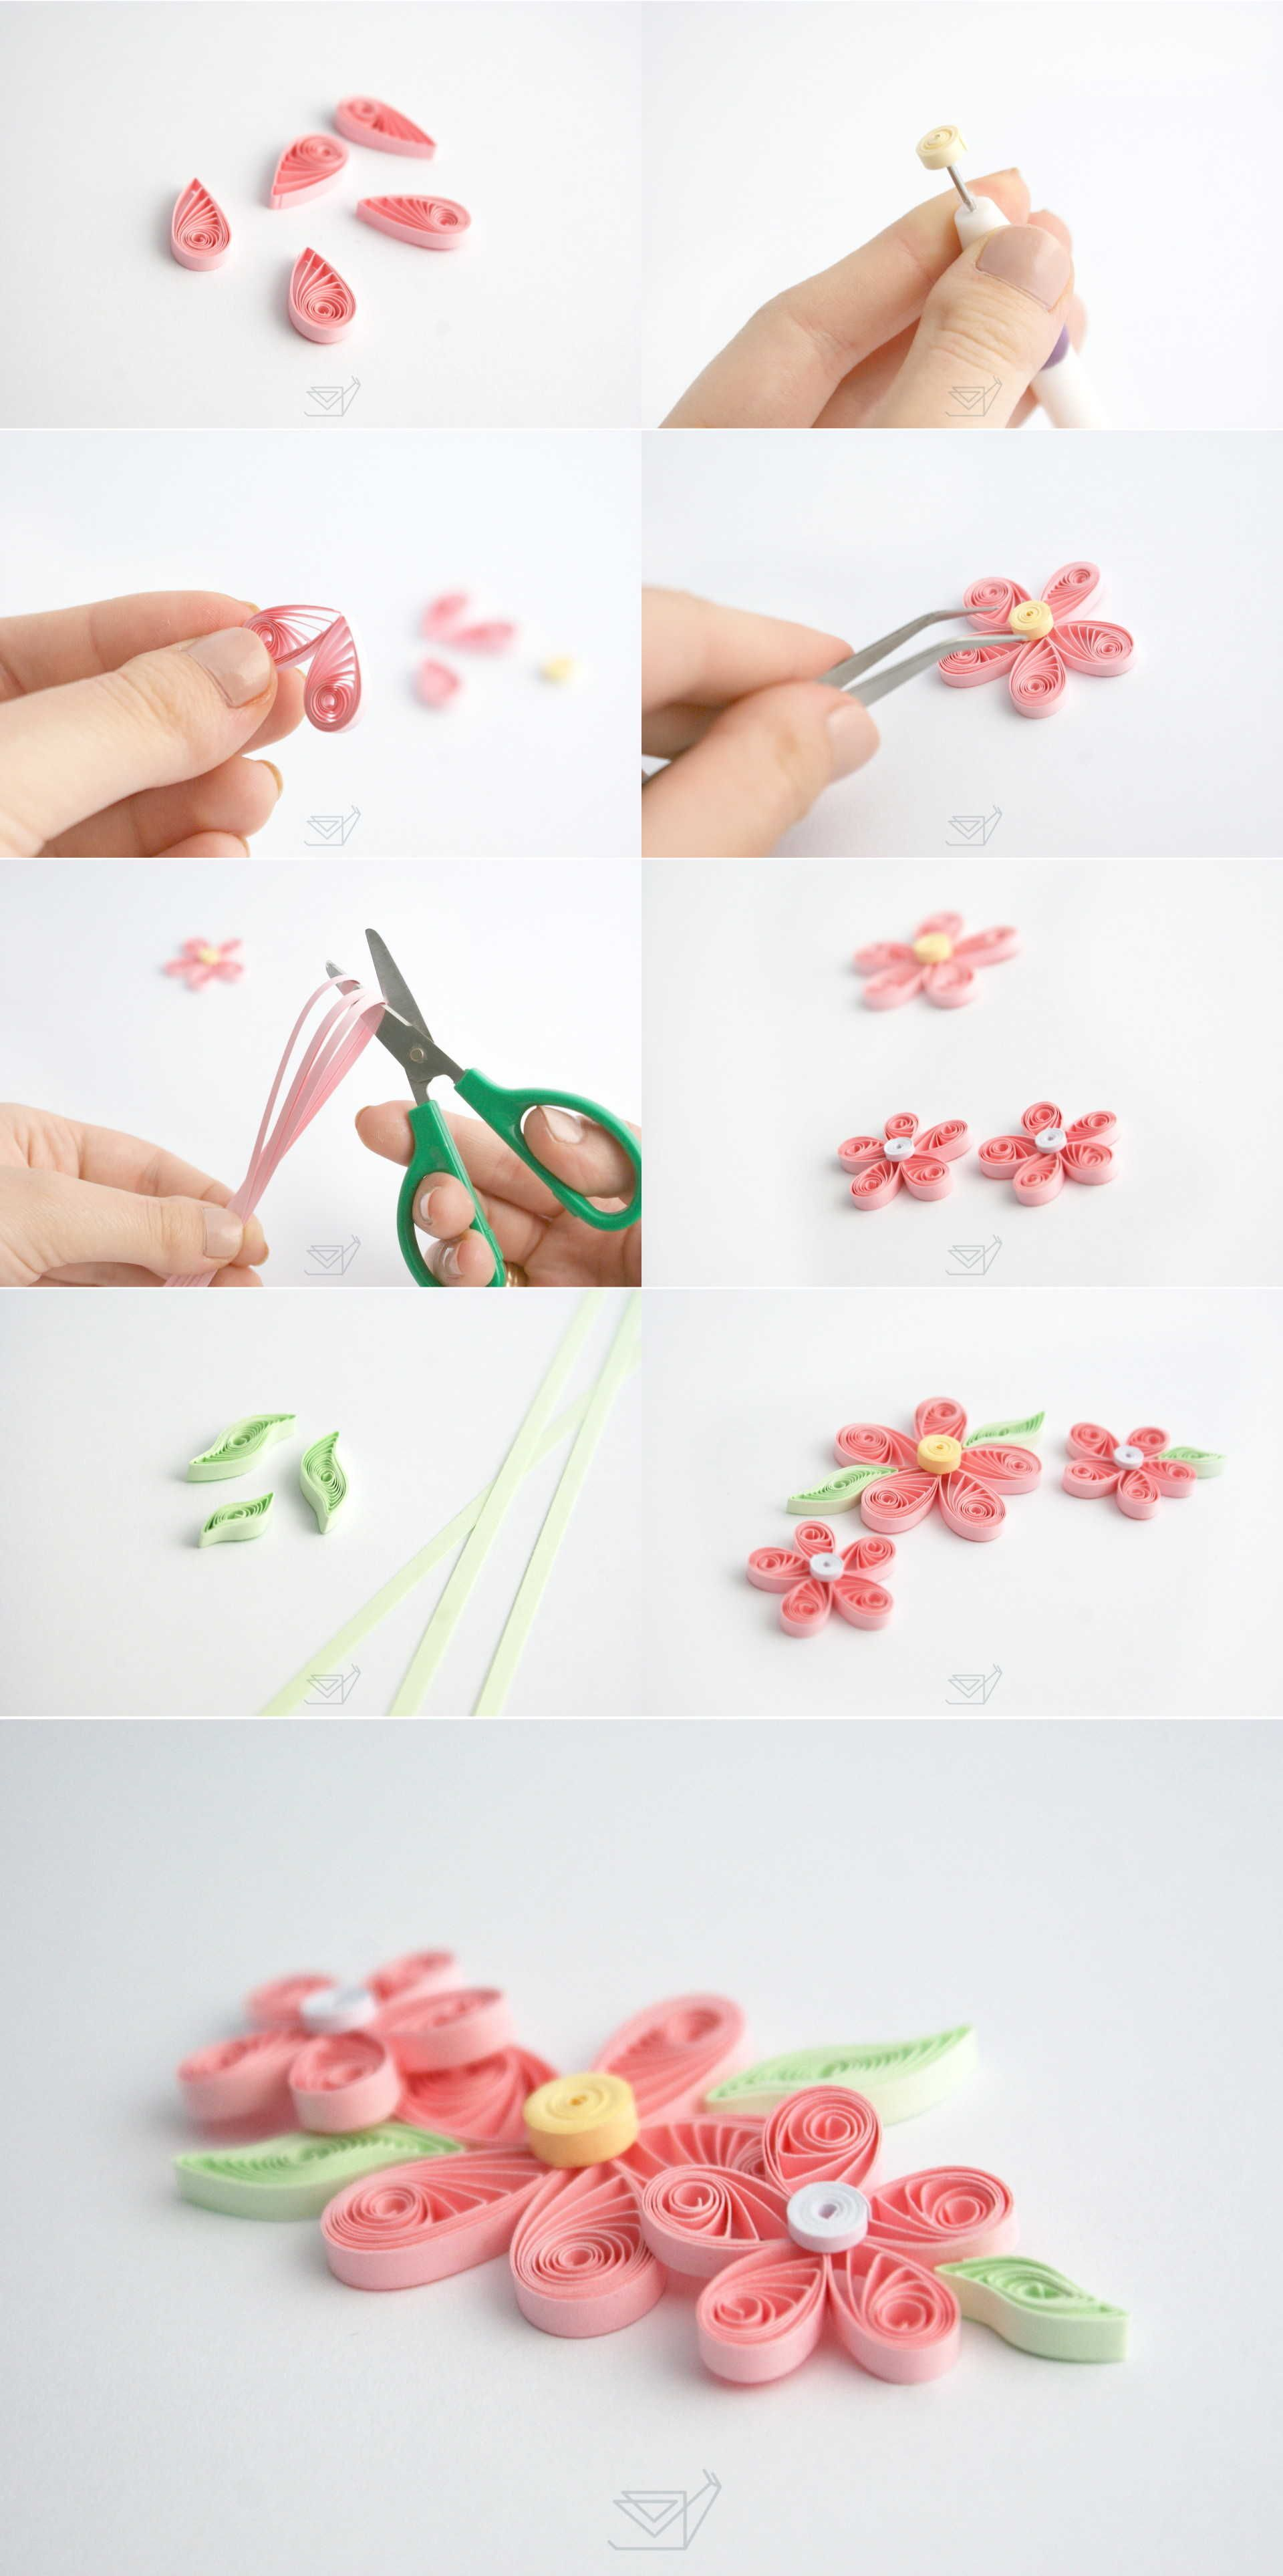 Quilling Tutorial Basic Flower Easy Quillig For Beginners Poradnik Jak Zrobic Kwiatek Quilling Paper Quilling For Beginners Quilling Paper Craft Quilling Art